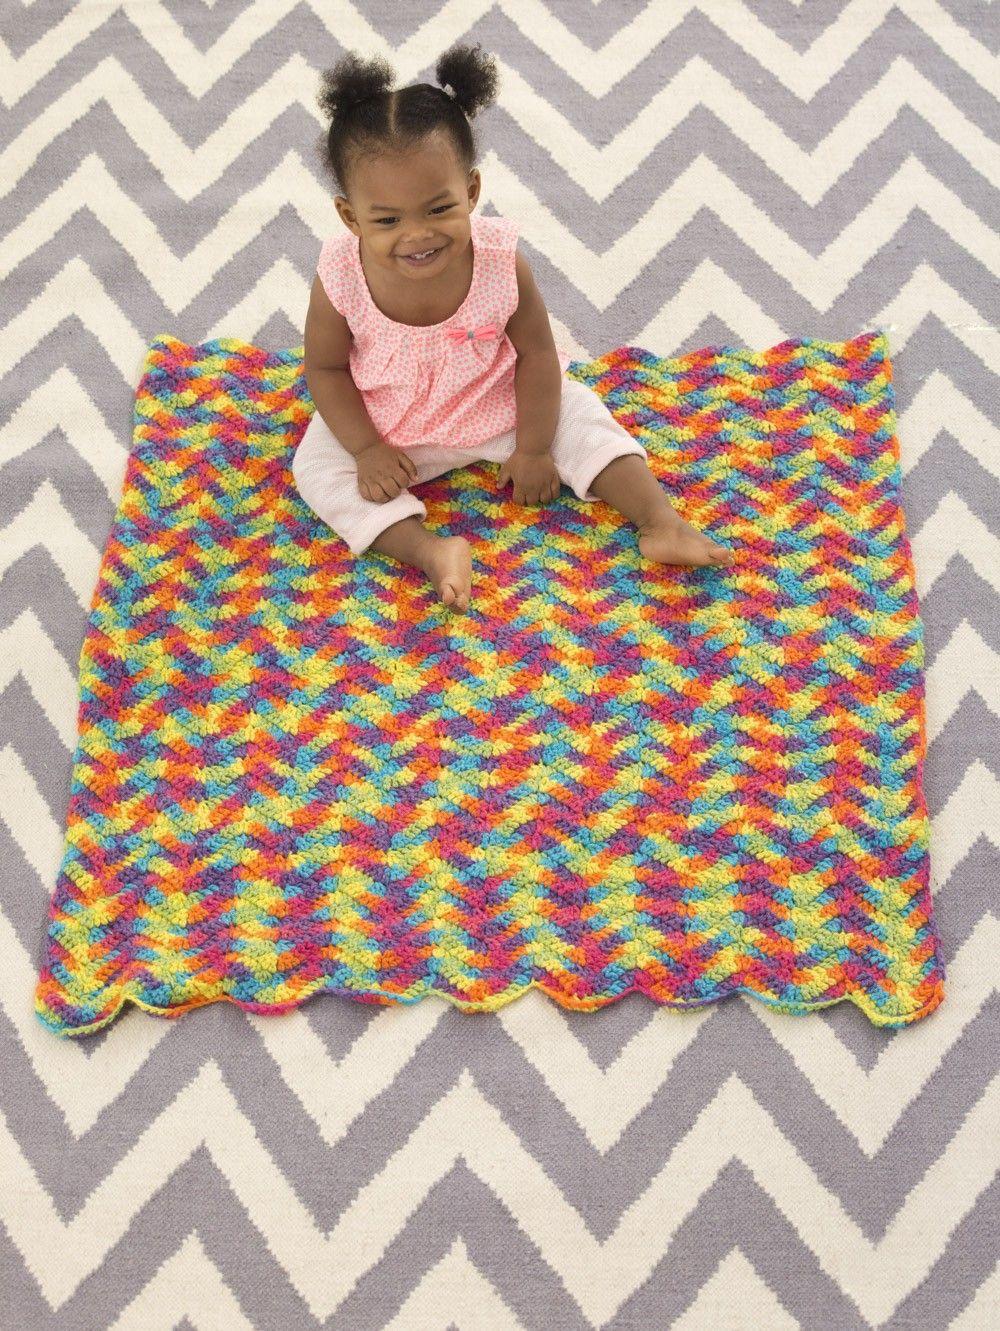 Technicolor Ripple Afghan (Crochet)   Crochet & Knits   Pinterest